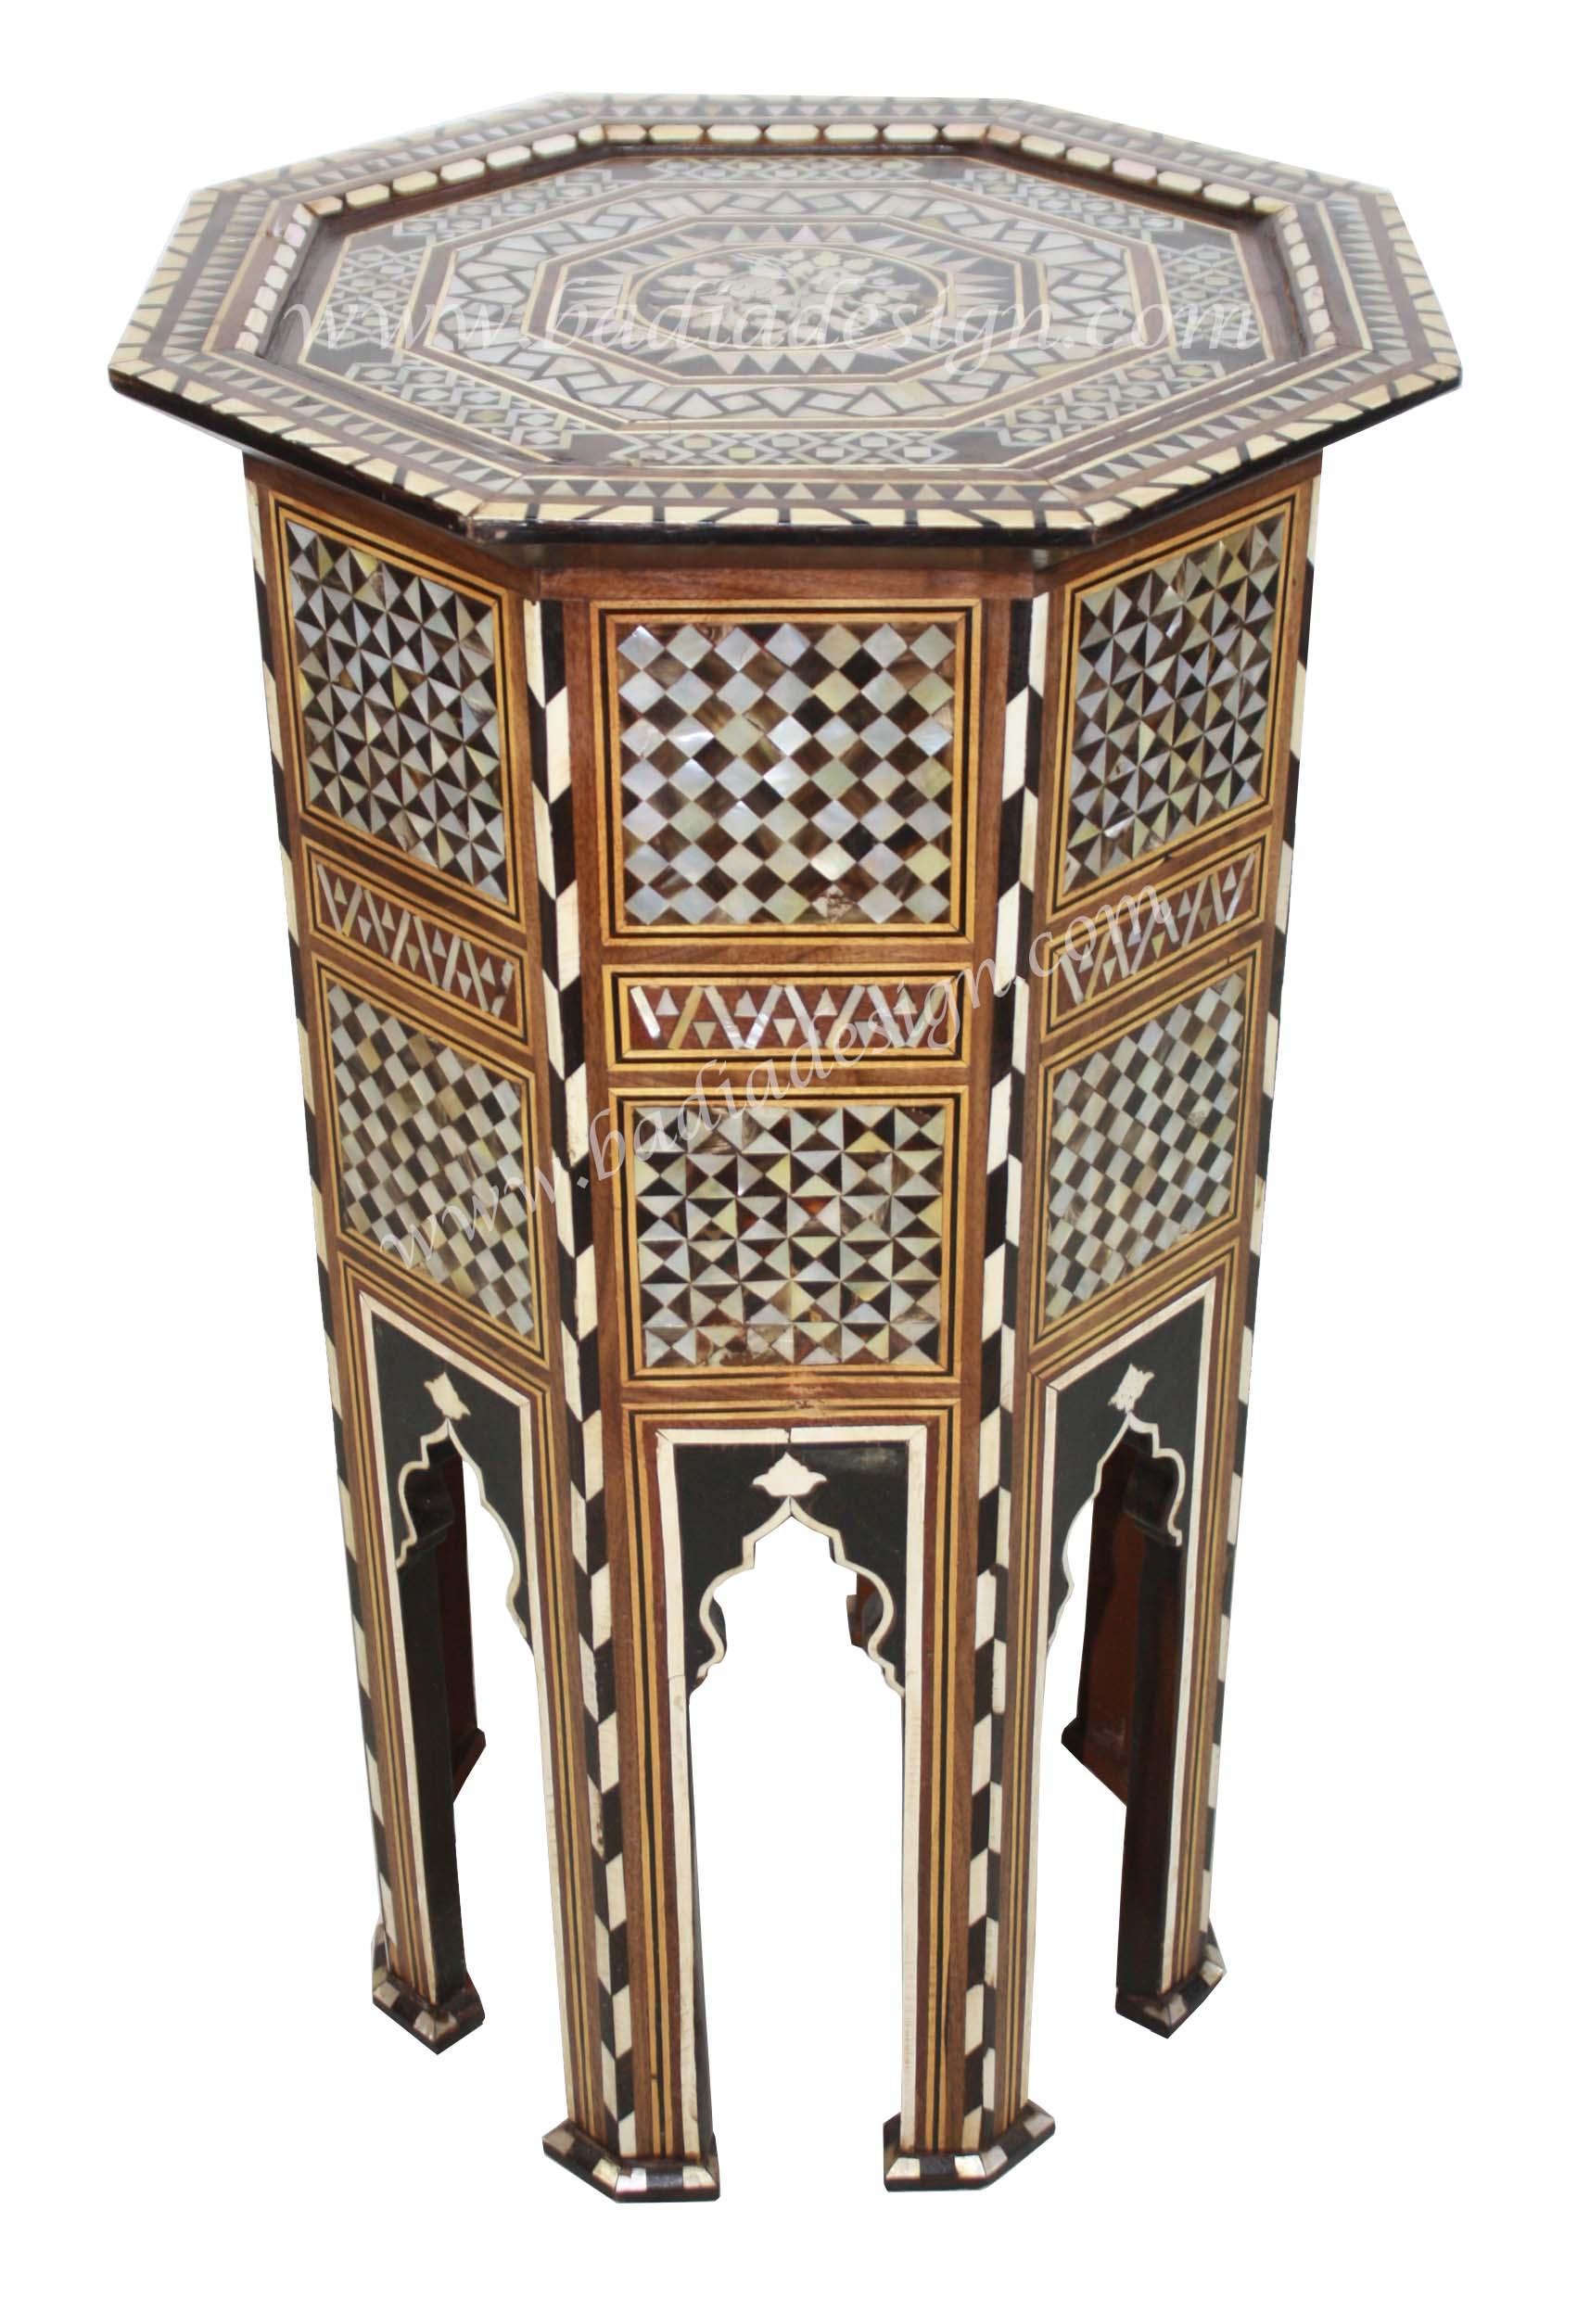 syrian-indoor-furniture-mop-st069-1.jpg